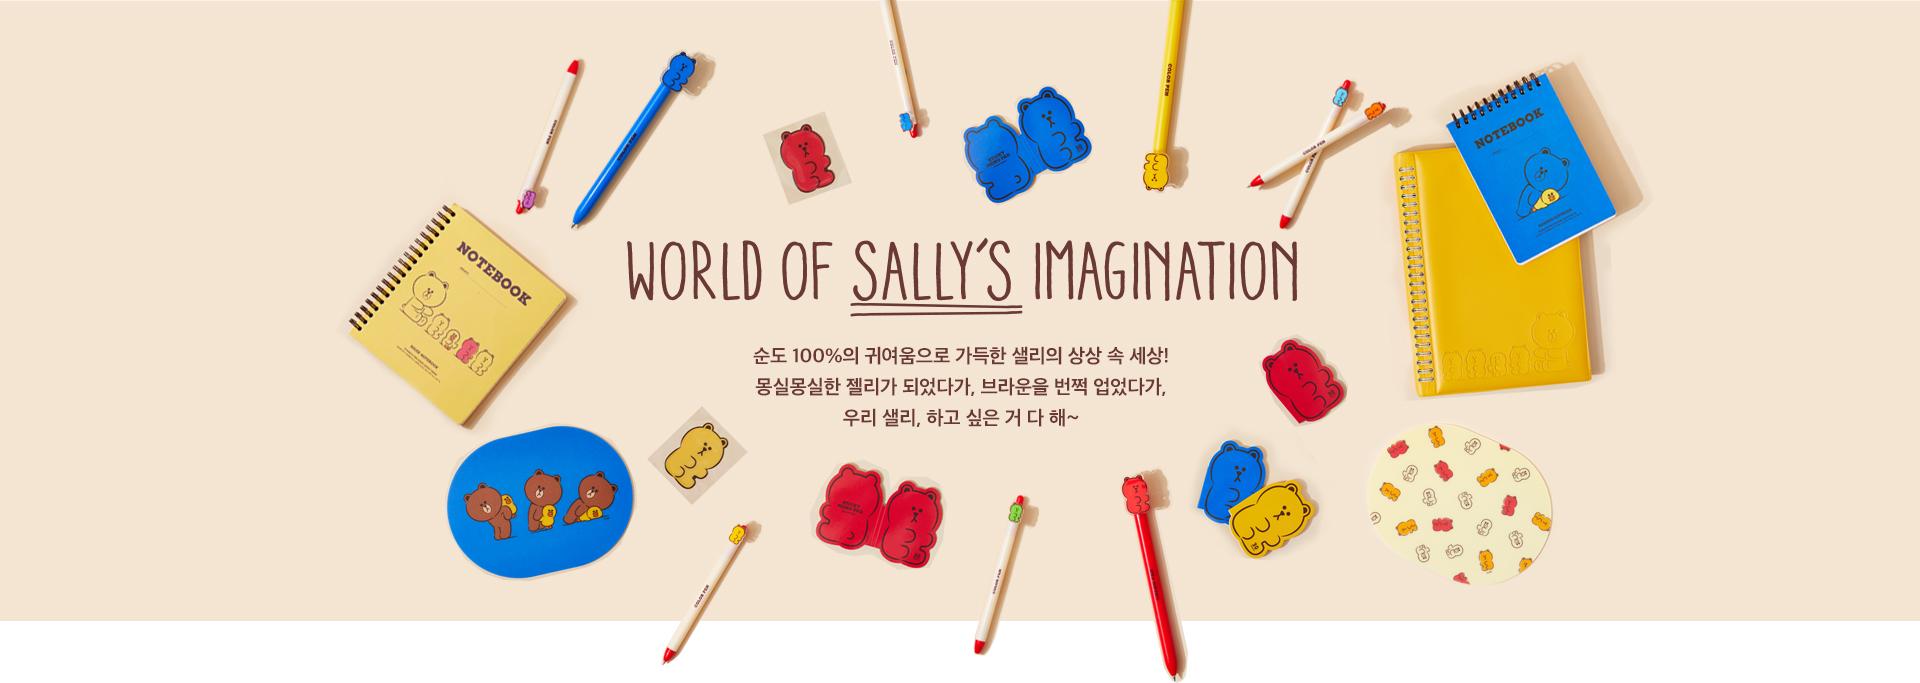 World of Sally's Imagination